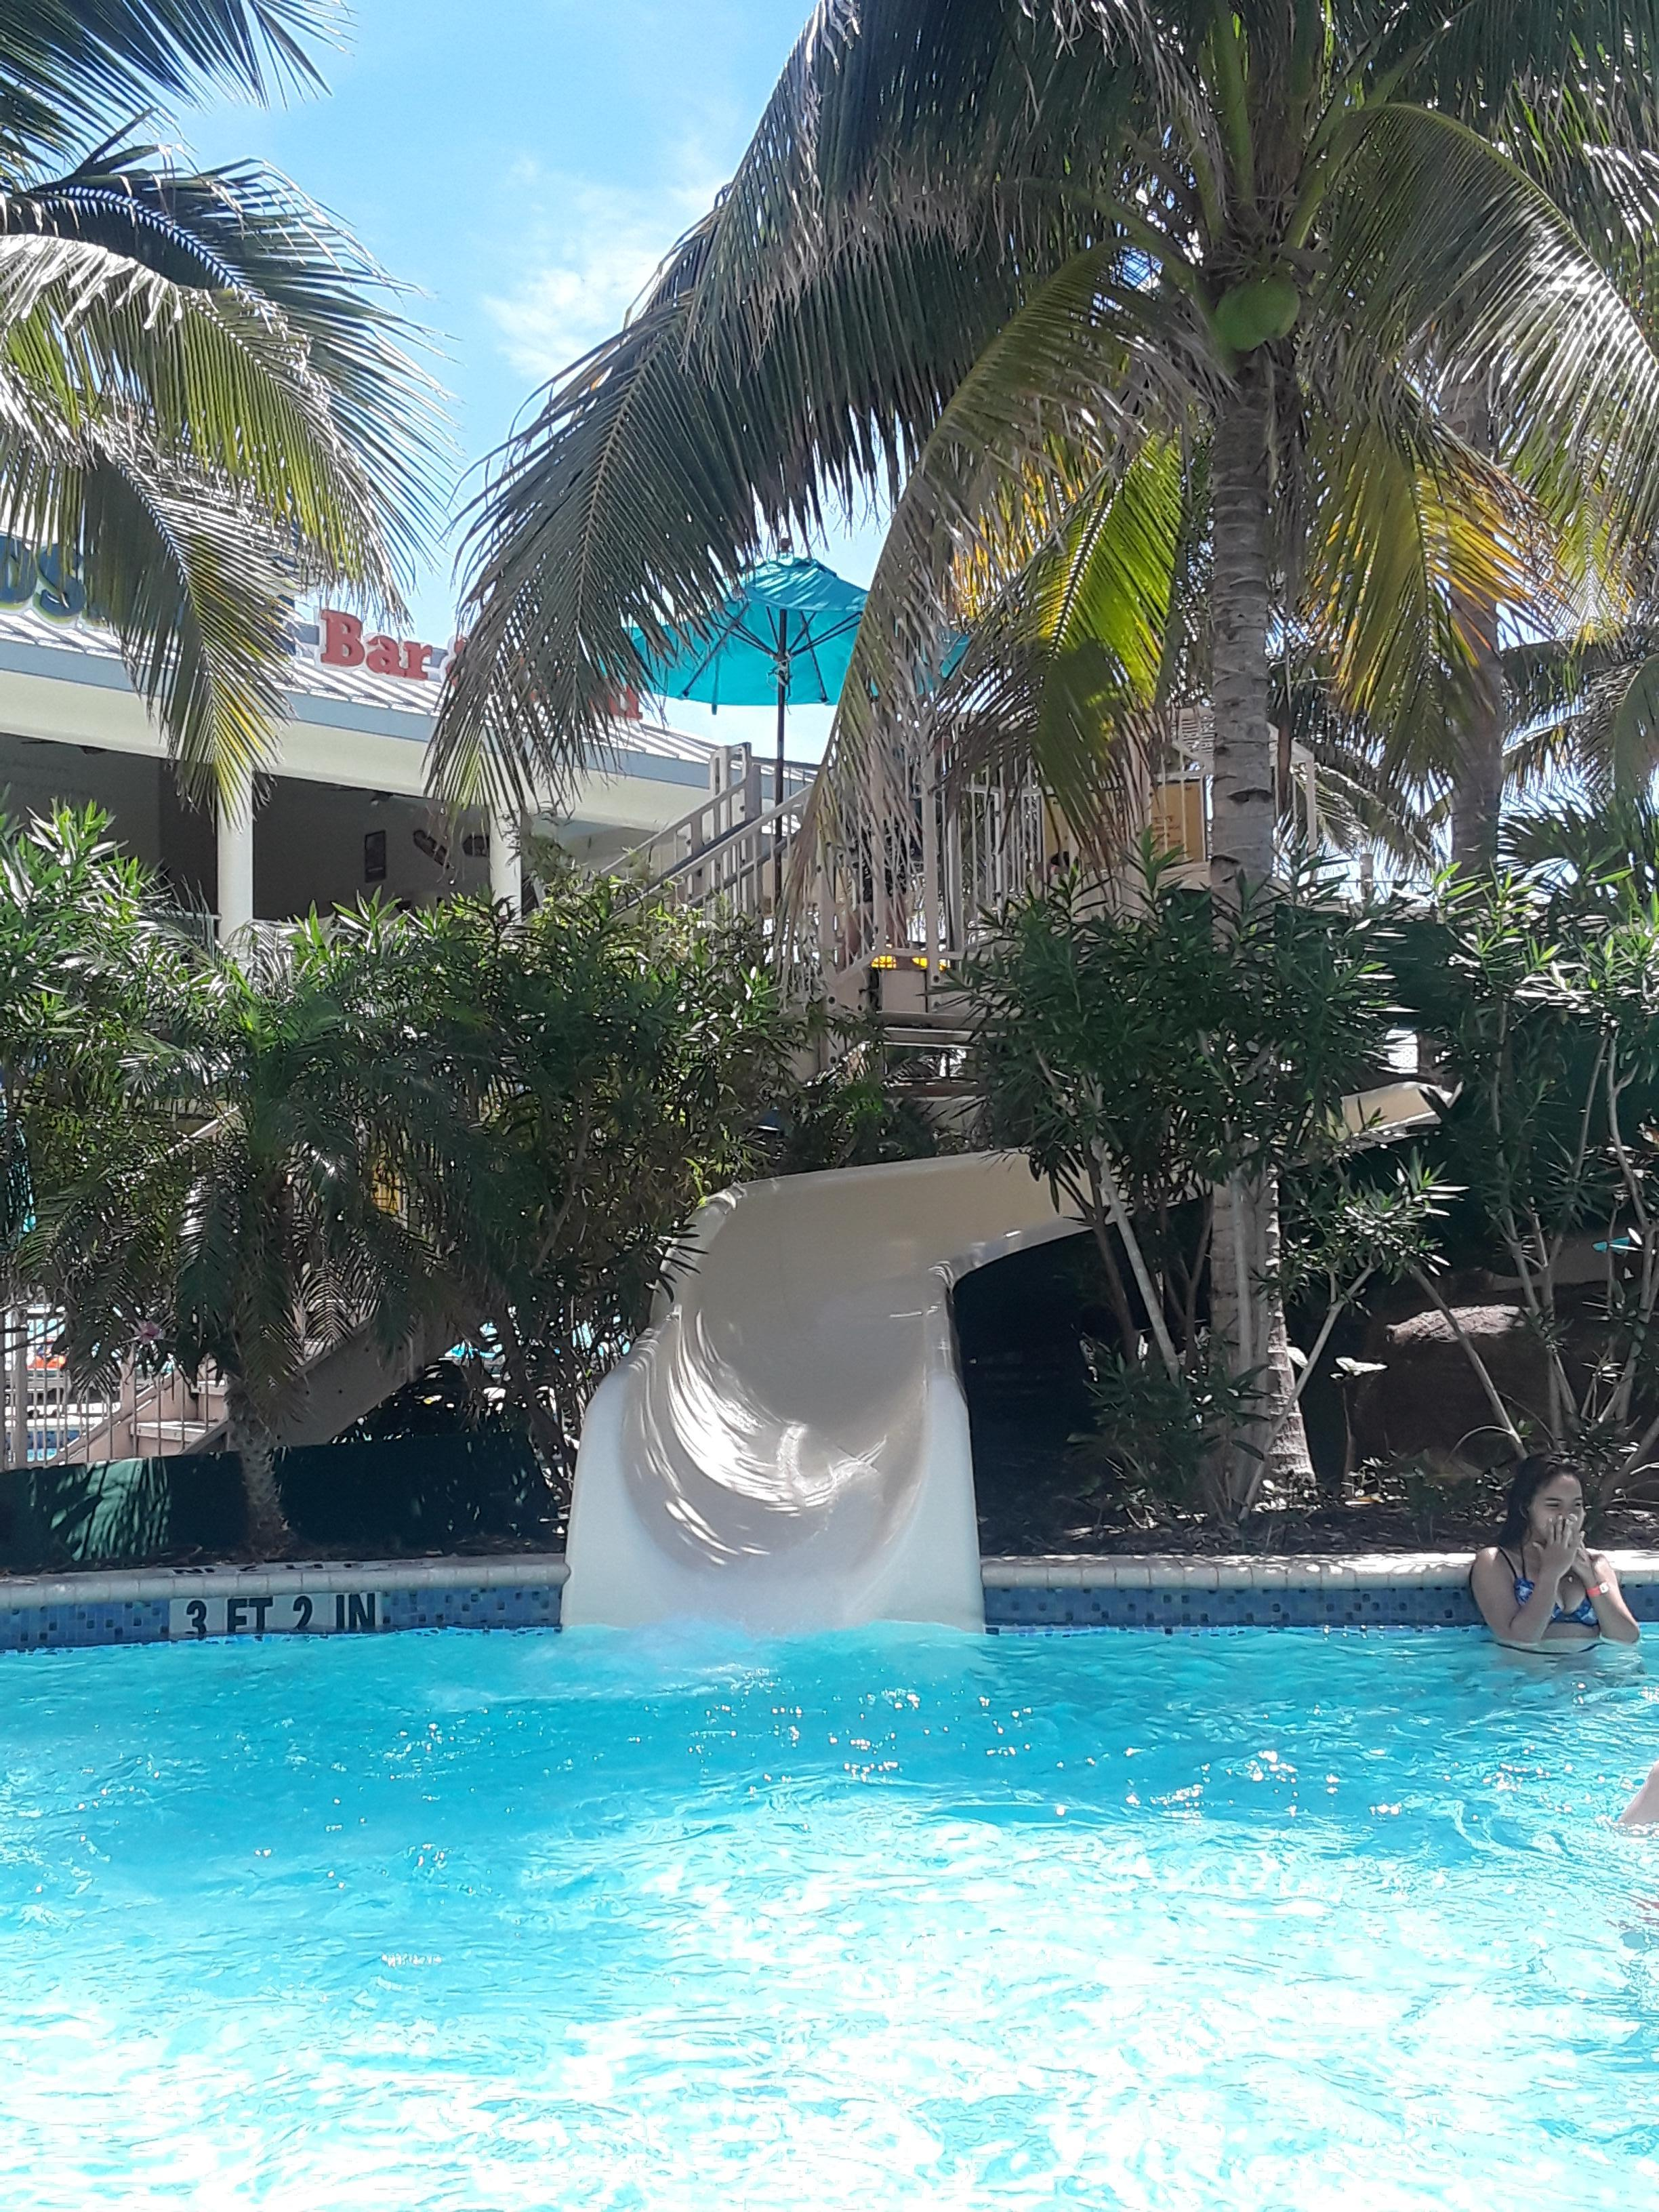 Margaritaville Hollywood Beach Resort, Fort Lauderdale